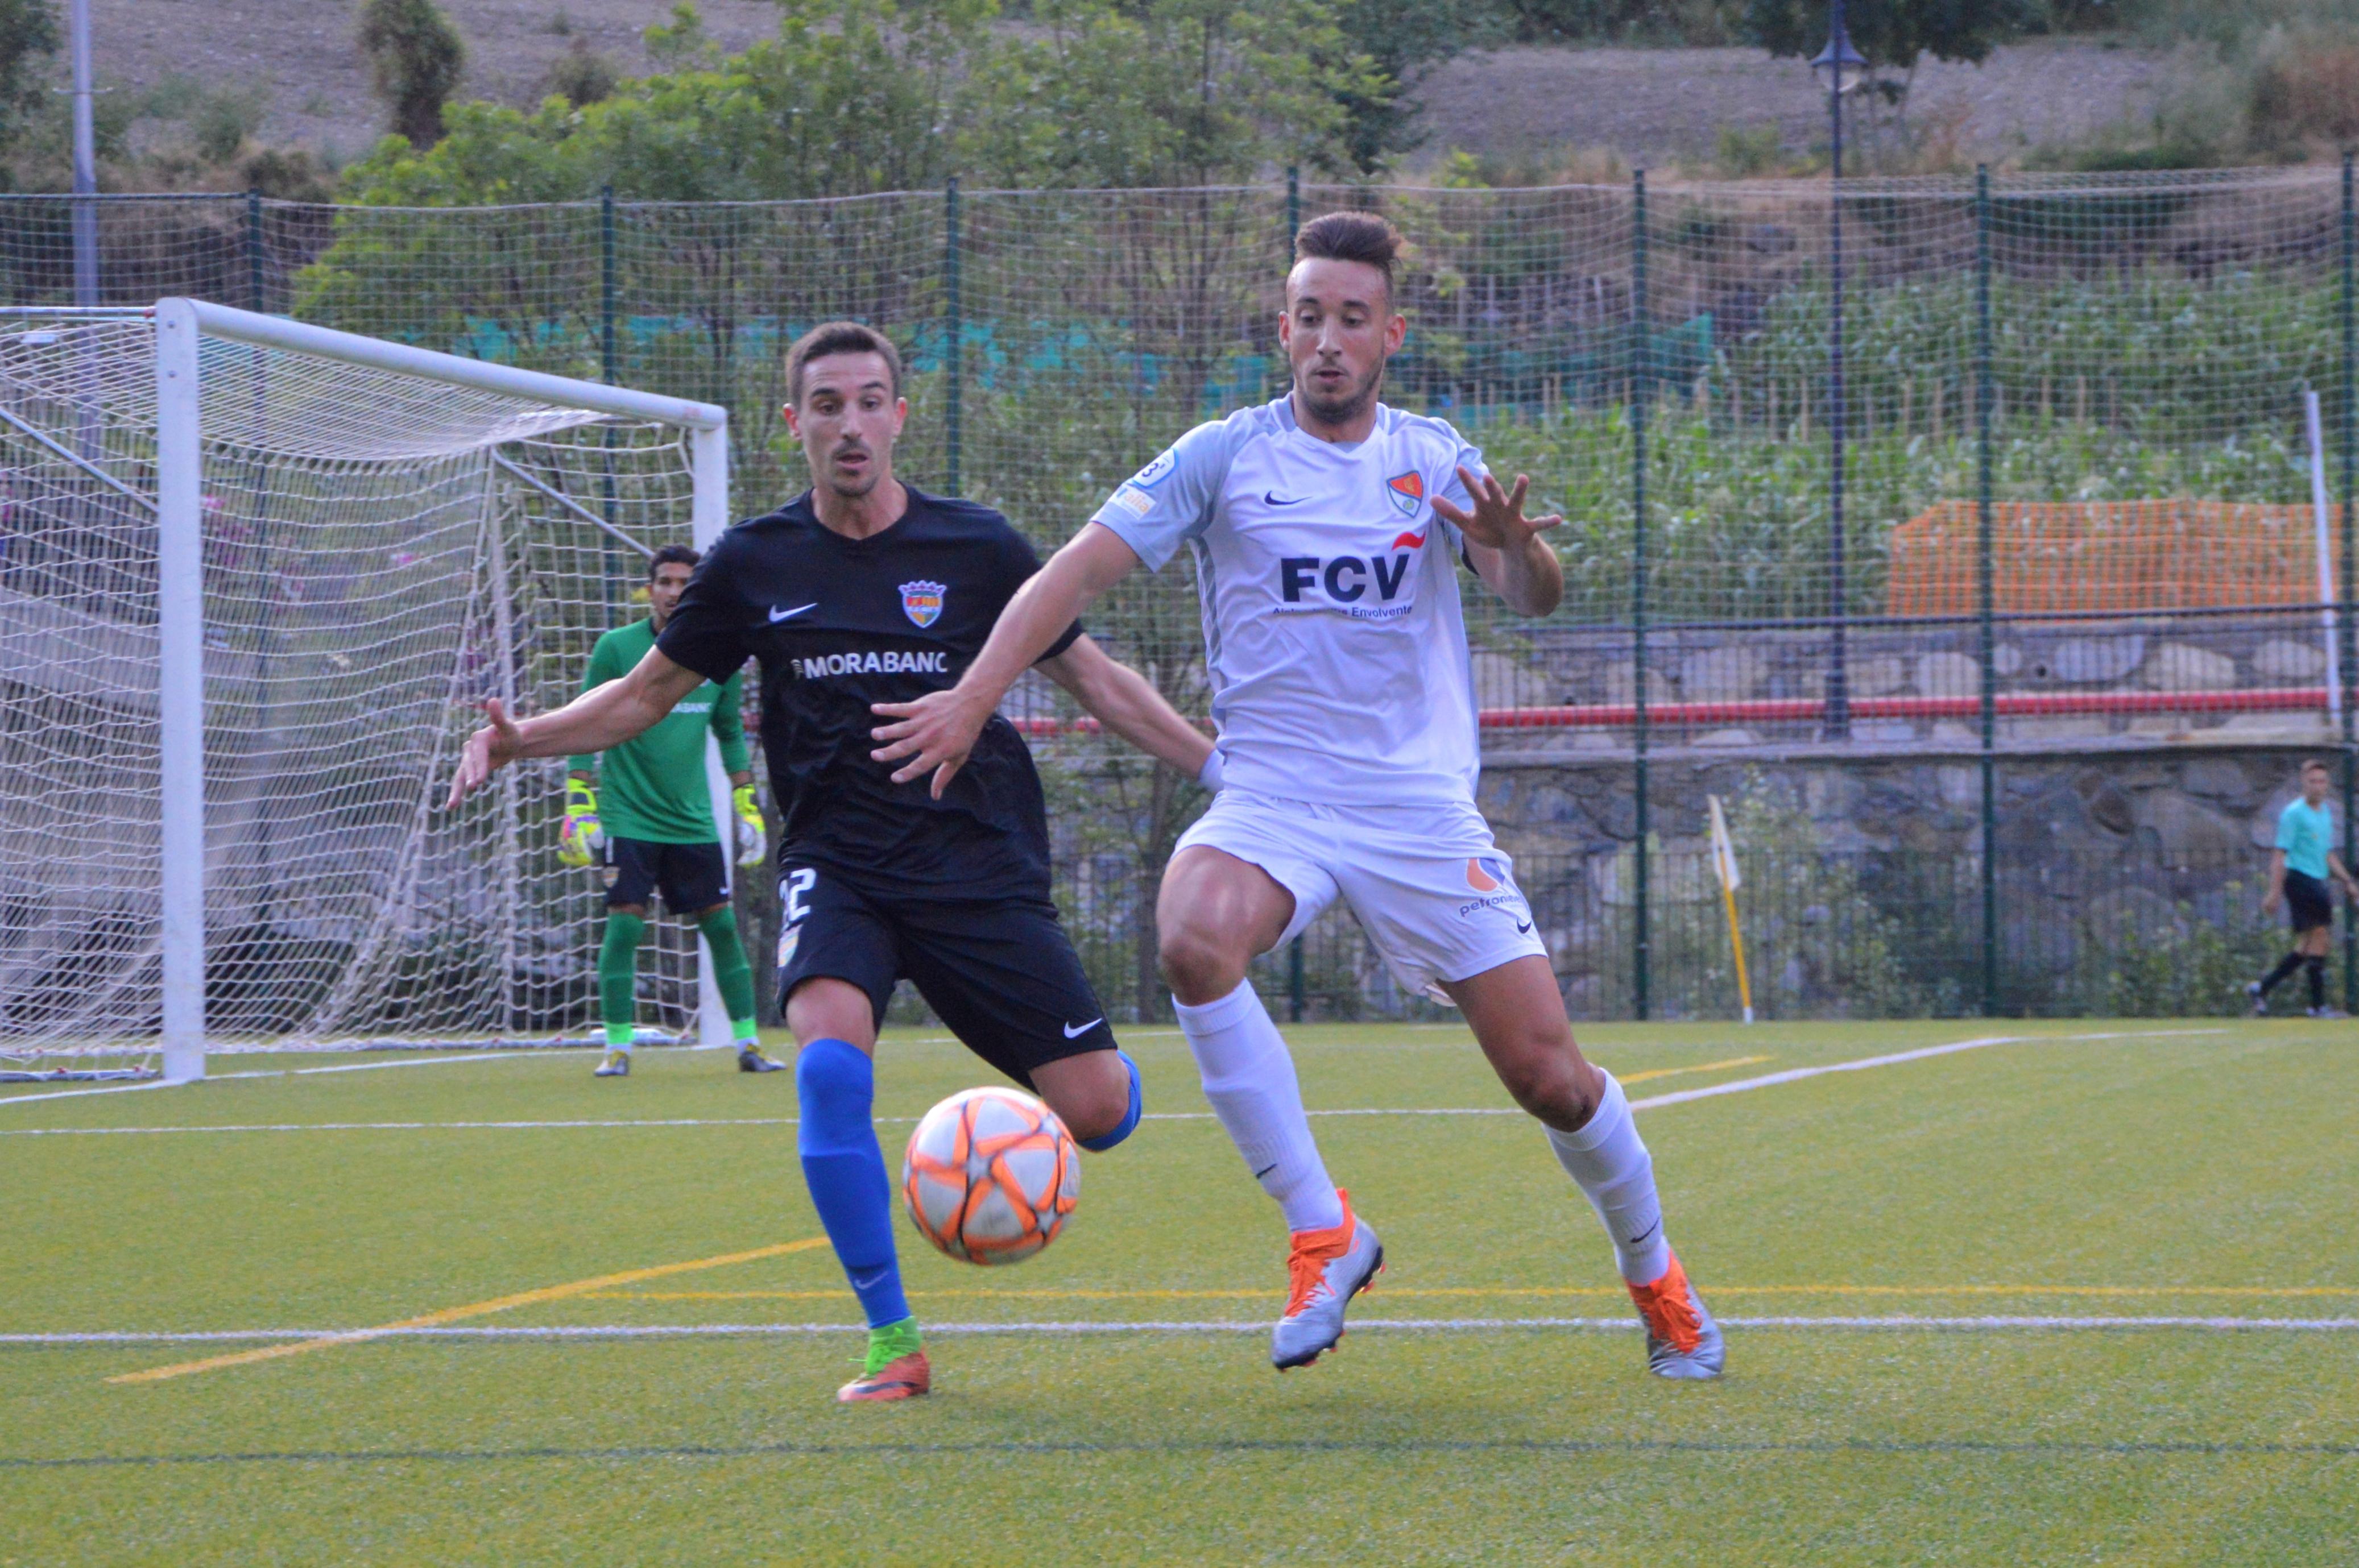 FC Andorra - Terrassa FC / FOTO: Juanma Medina, Terrassa FC